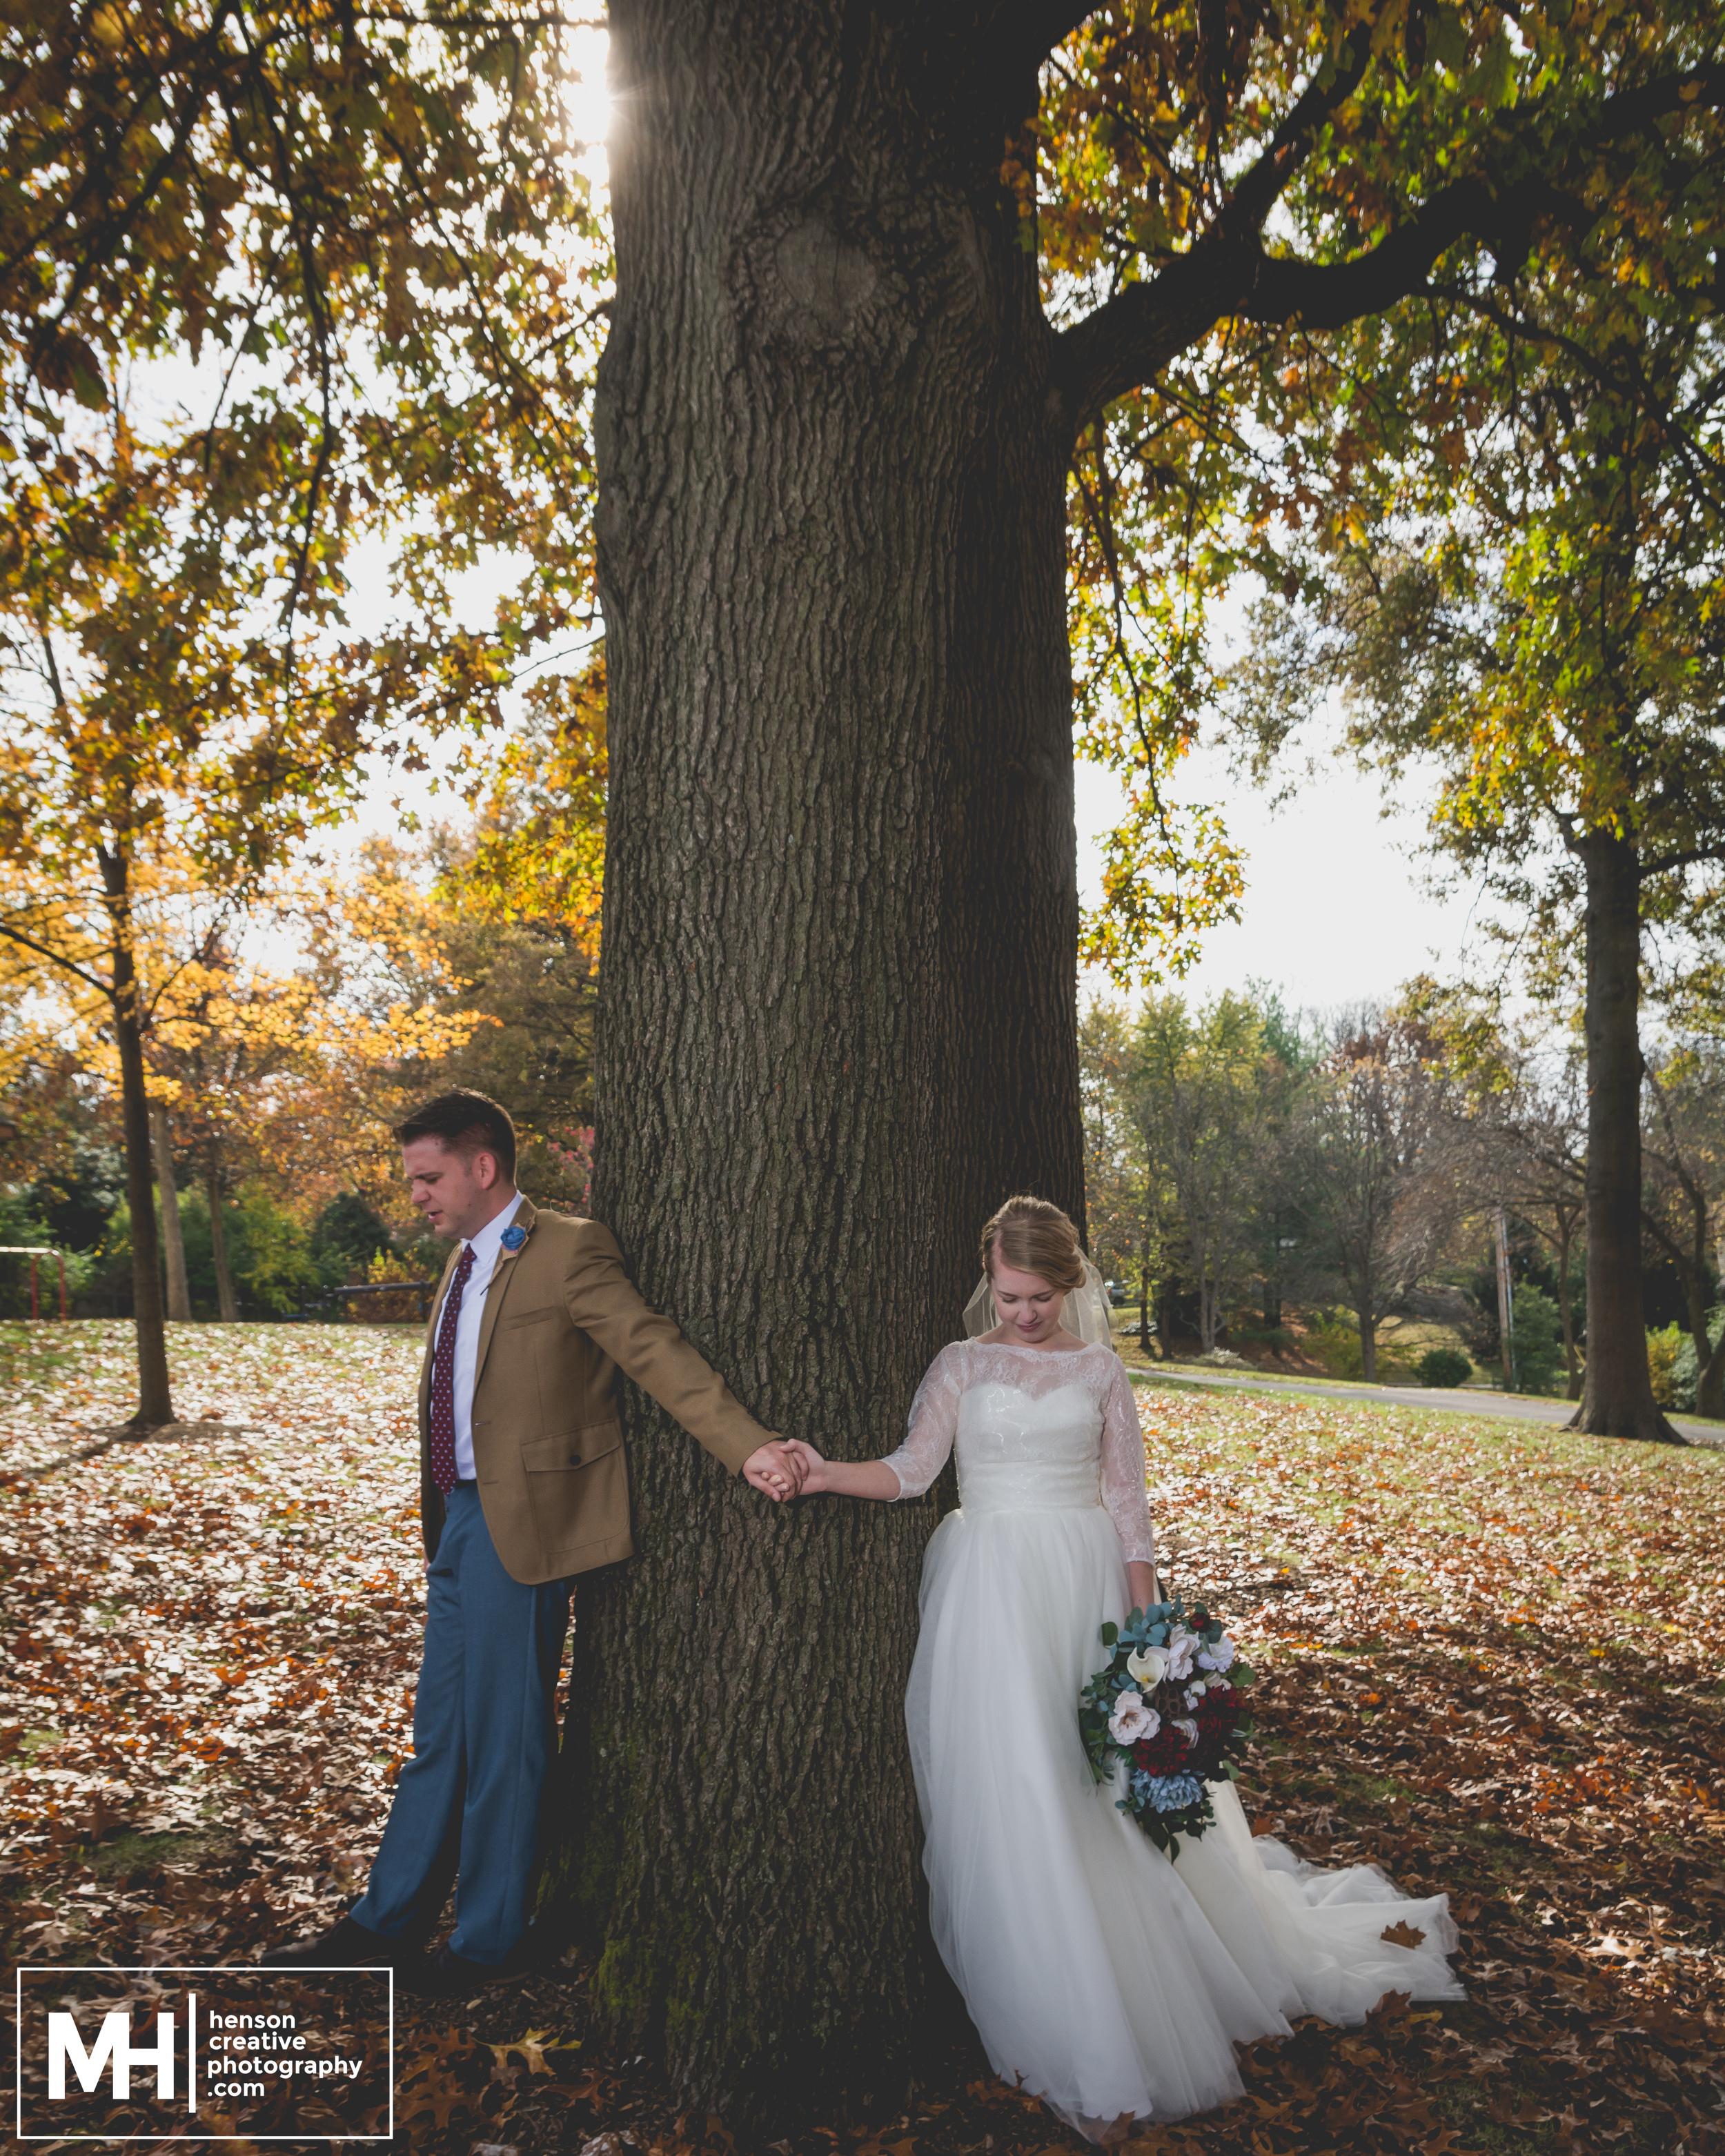 MooreWeddingWeb - Henson Creative - St. Louis Wedding Photographer-3.jpg